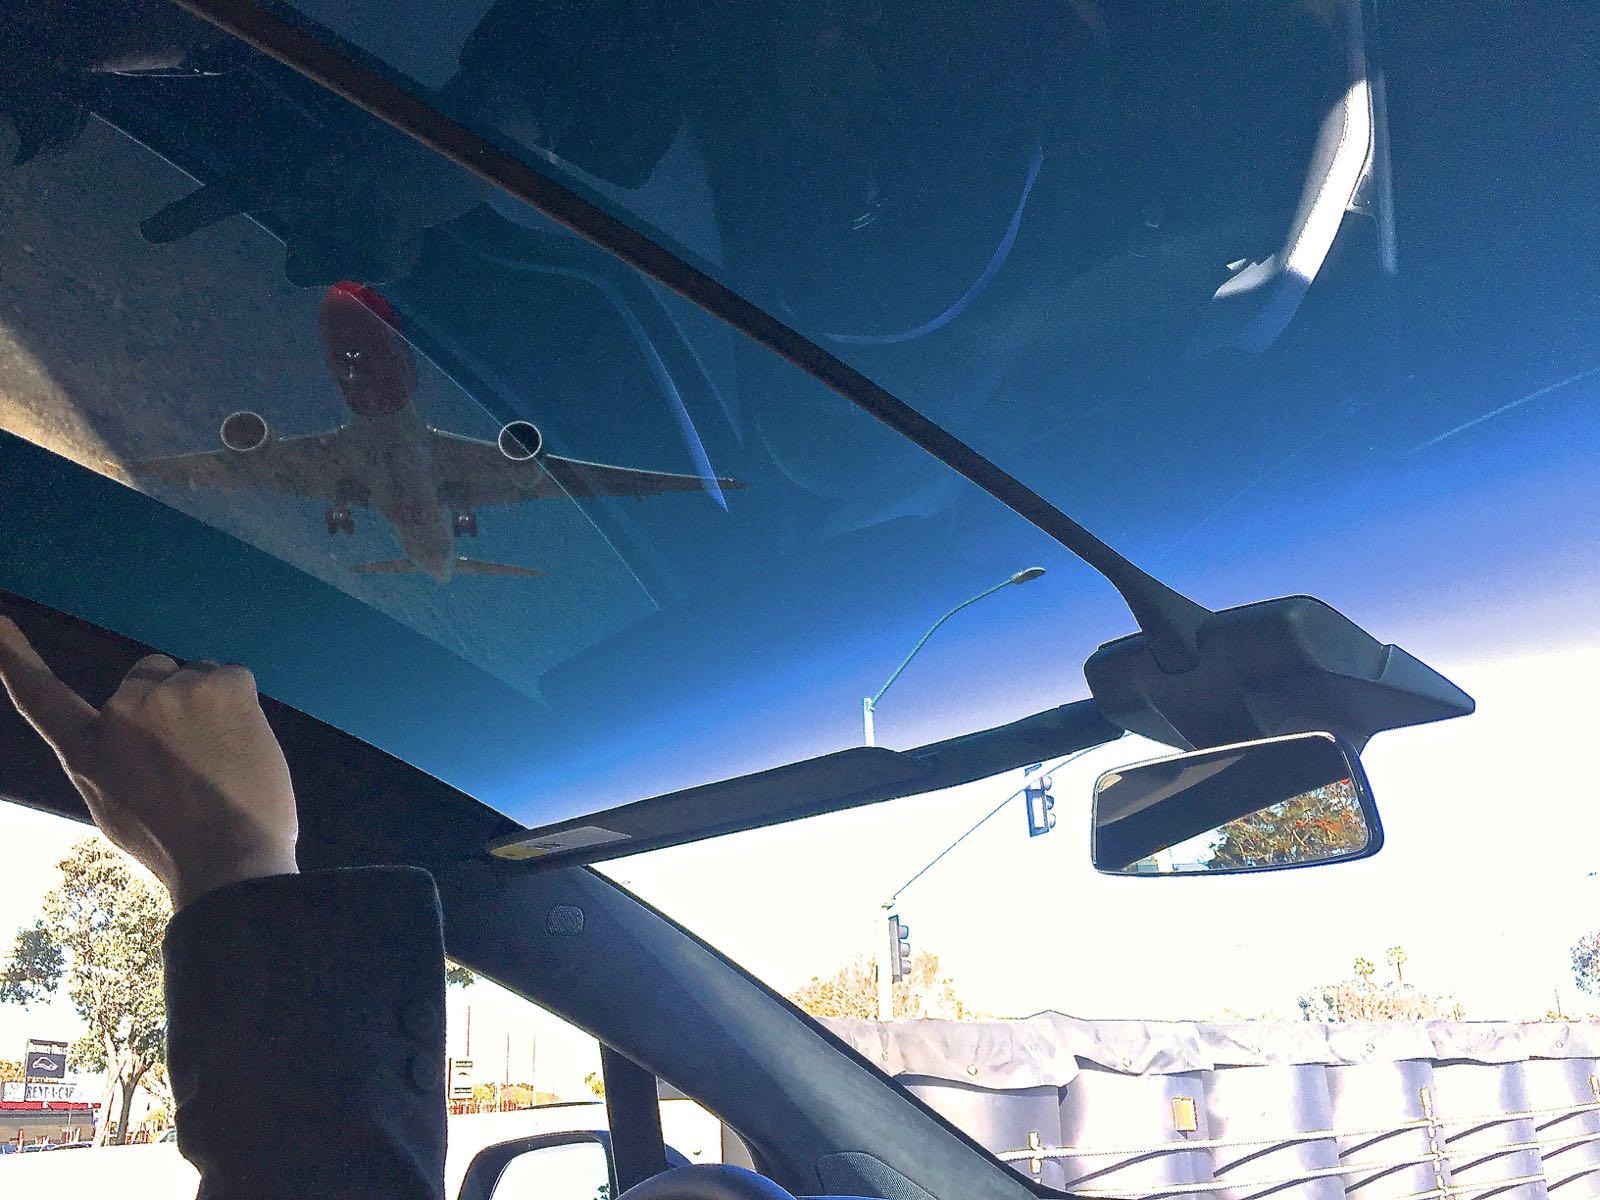 model-x-panoramic-windshield-view-airplane